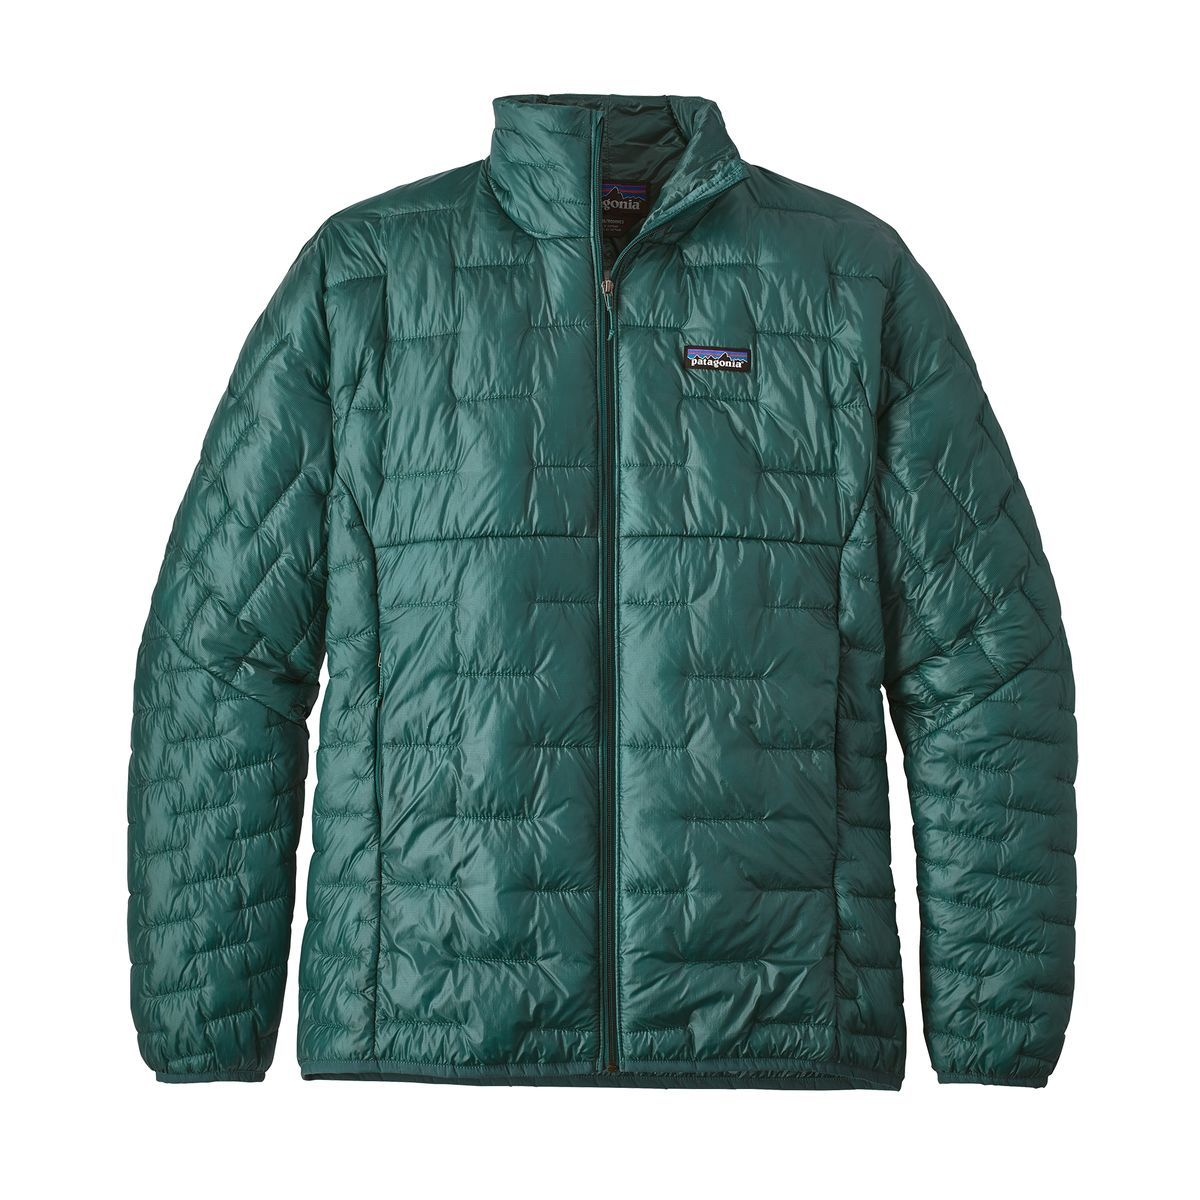 Men S Micro Puff Jacket Patagonia Mens Jackets Mens Jackets [ 1200 x 1200 Pixel ]